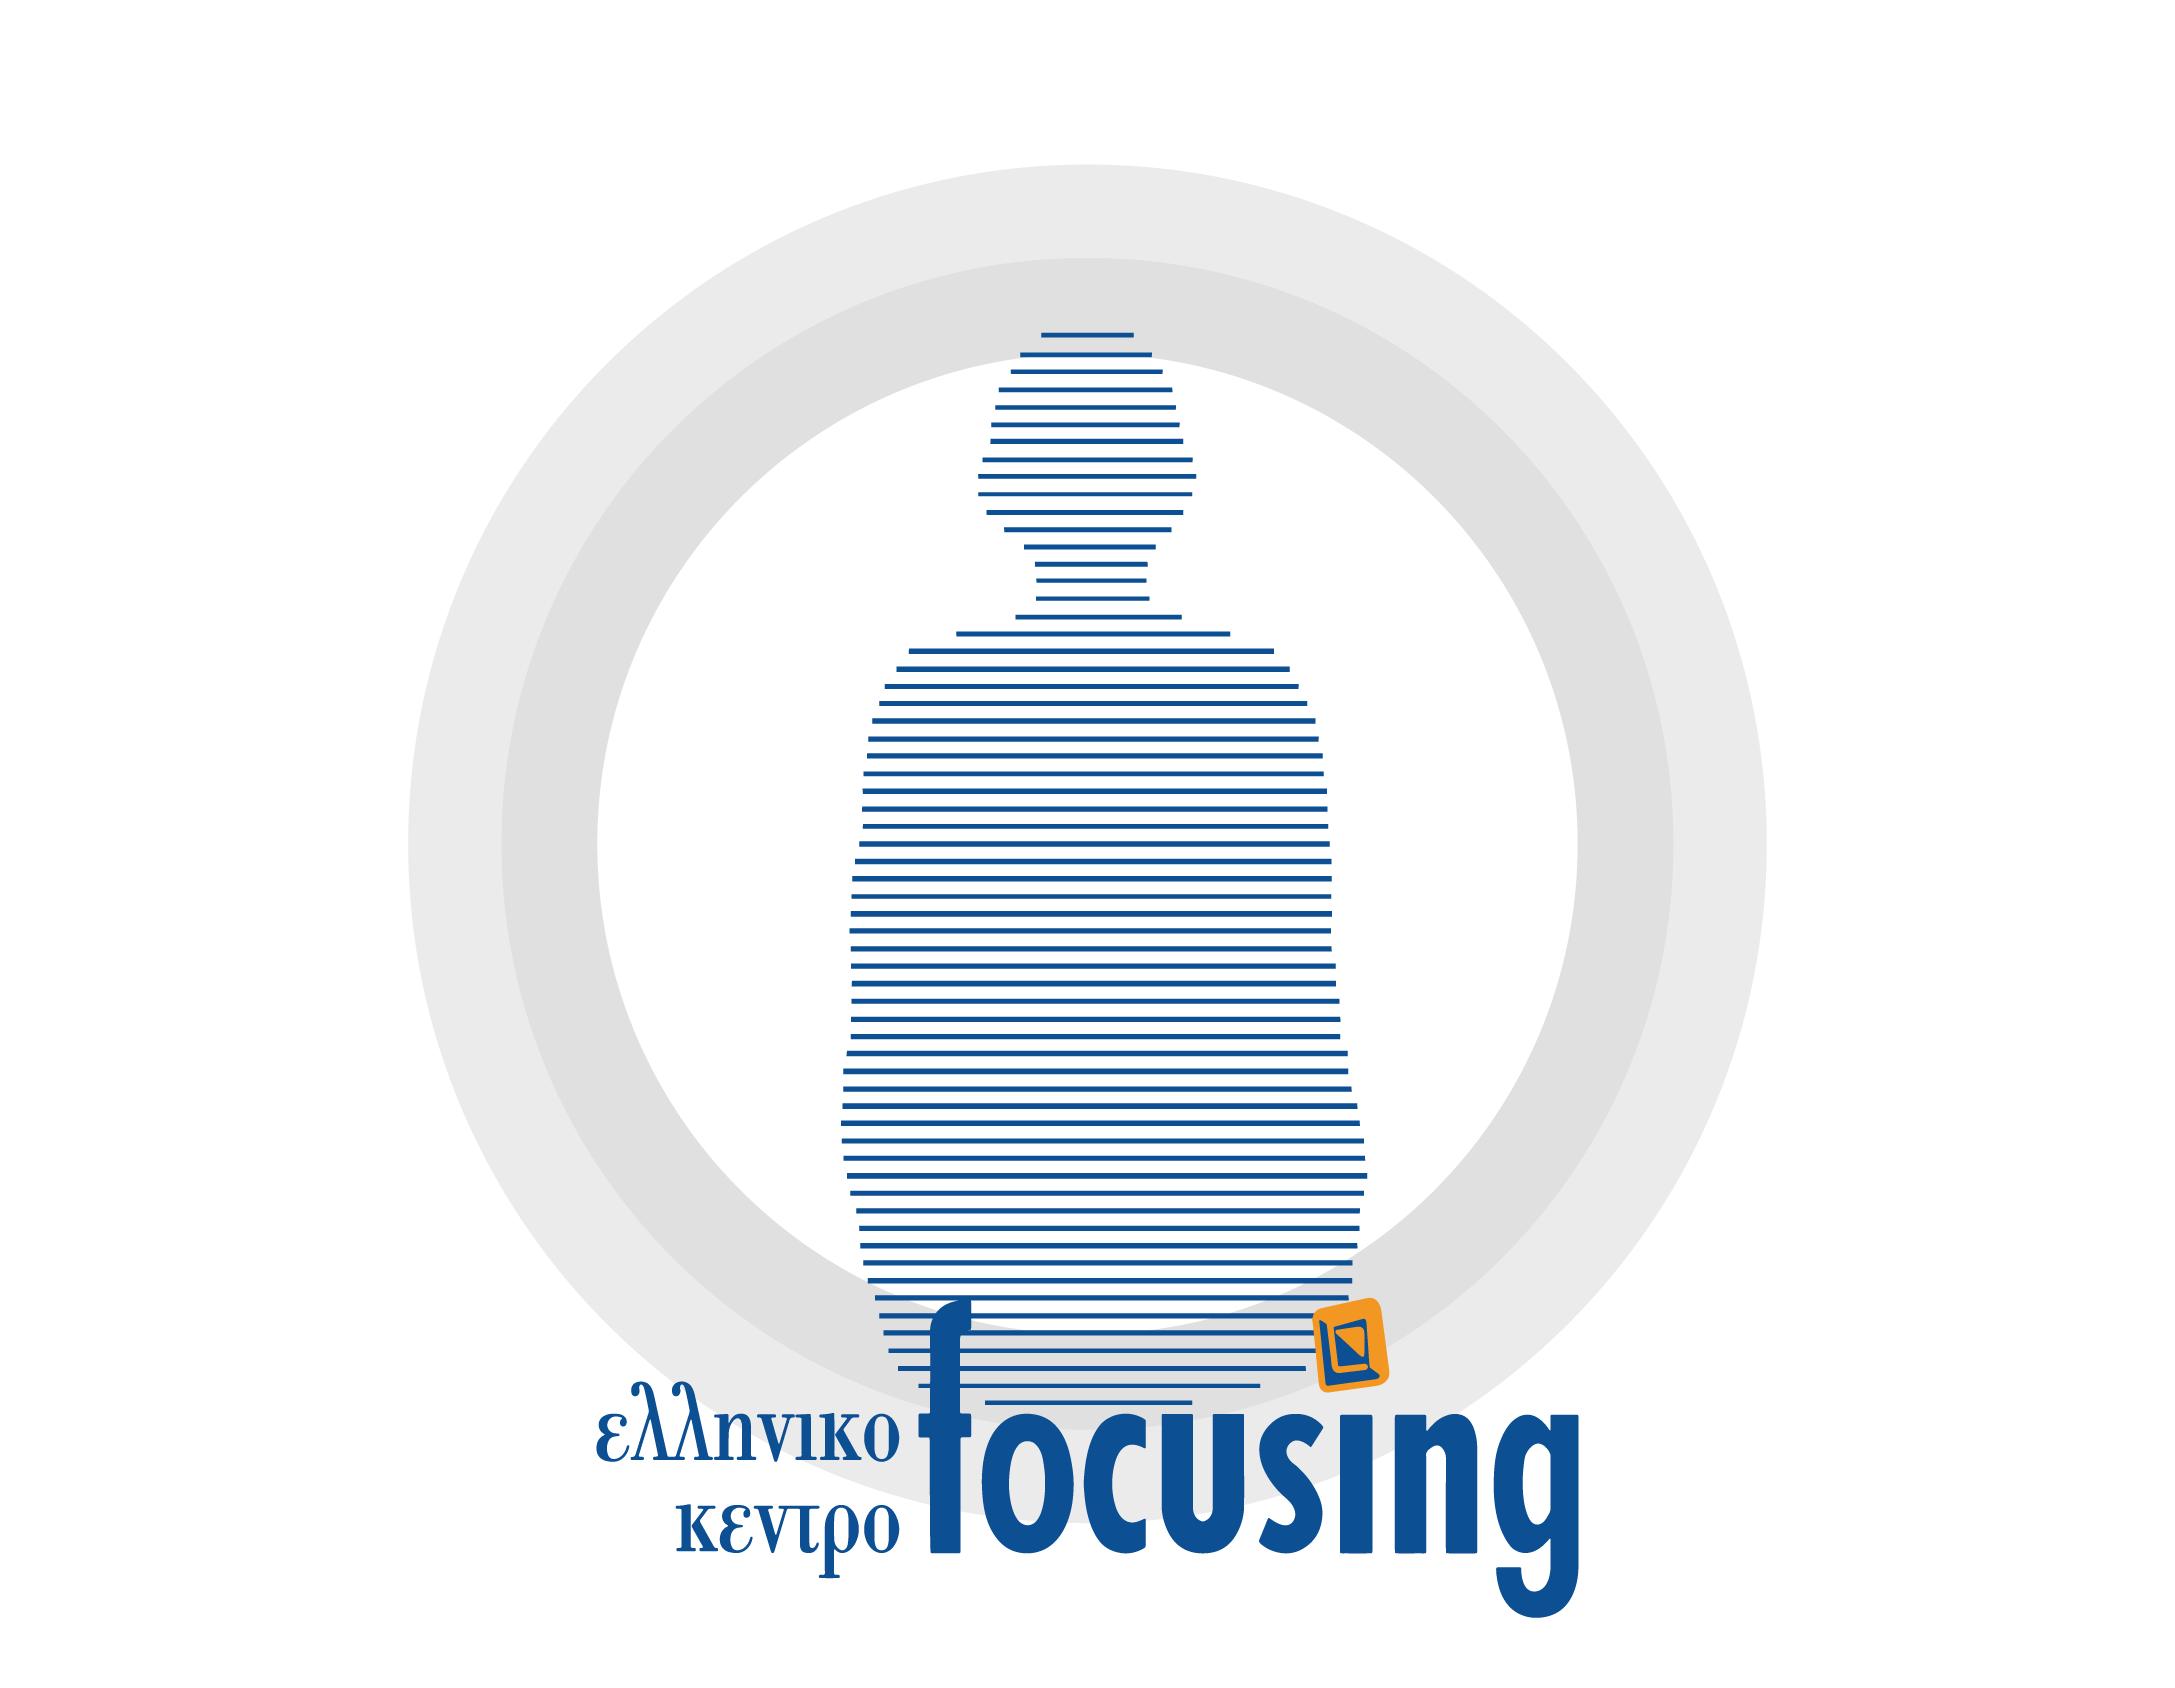 Focusing και Όνειρα – Νικόλαος Κυπριωτάκης – Εποχή 10